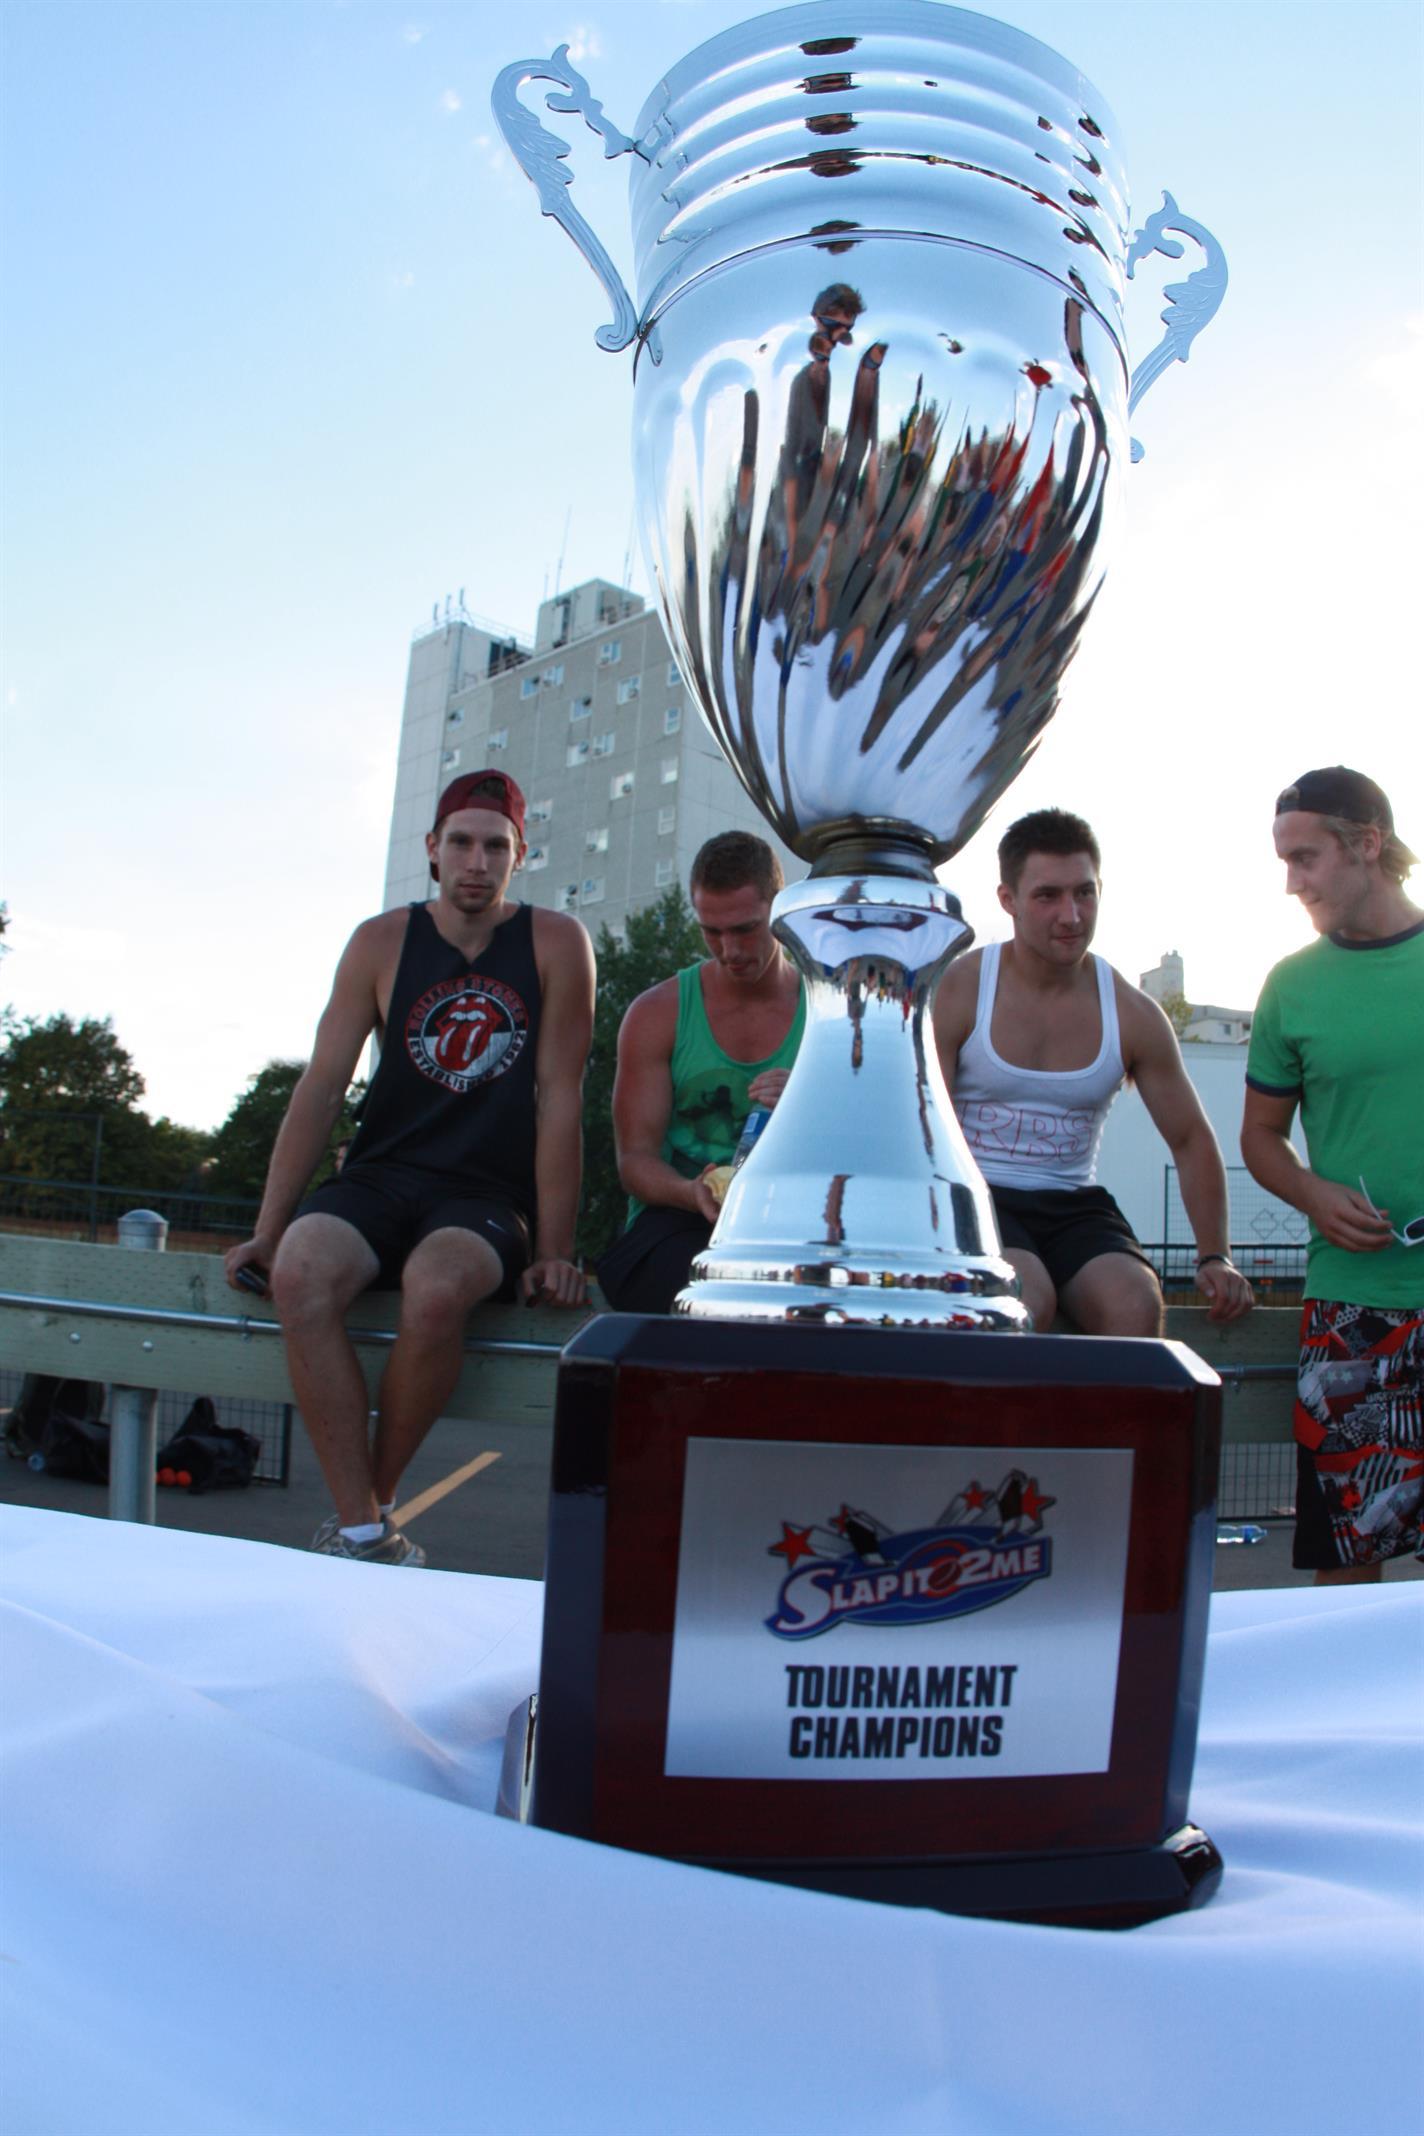 SlapIt2me Trophy